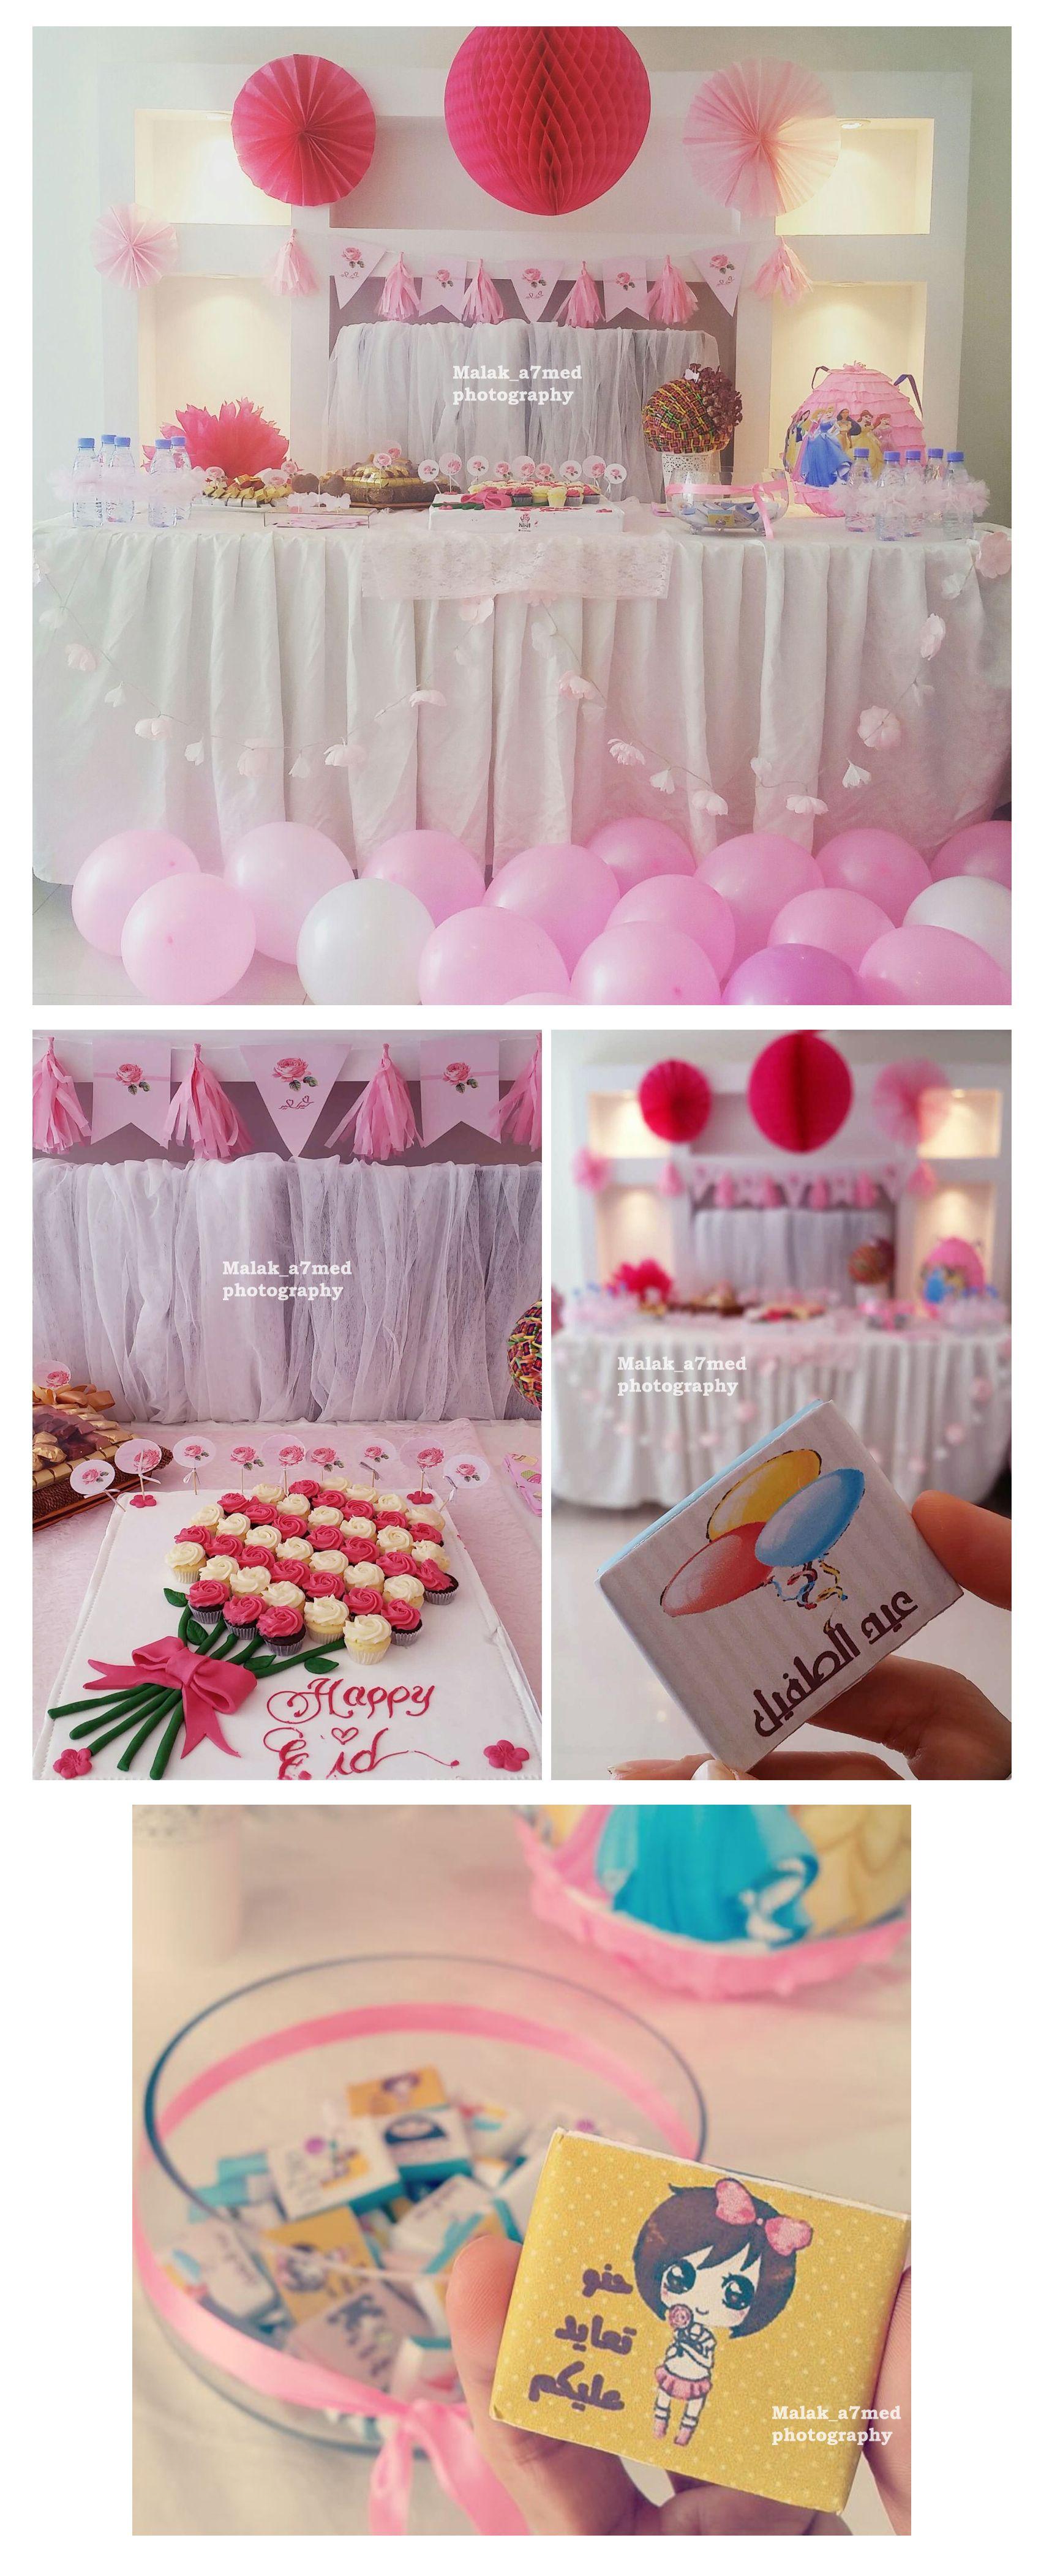 Happy Eid 2015 صباح العيد Party Decorations Party Desserts